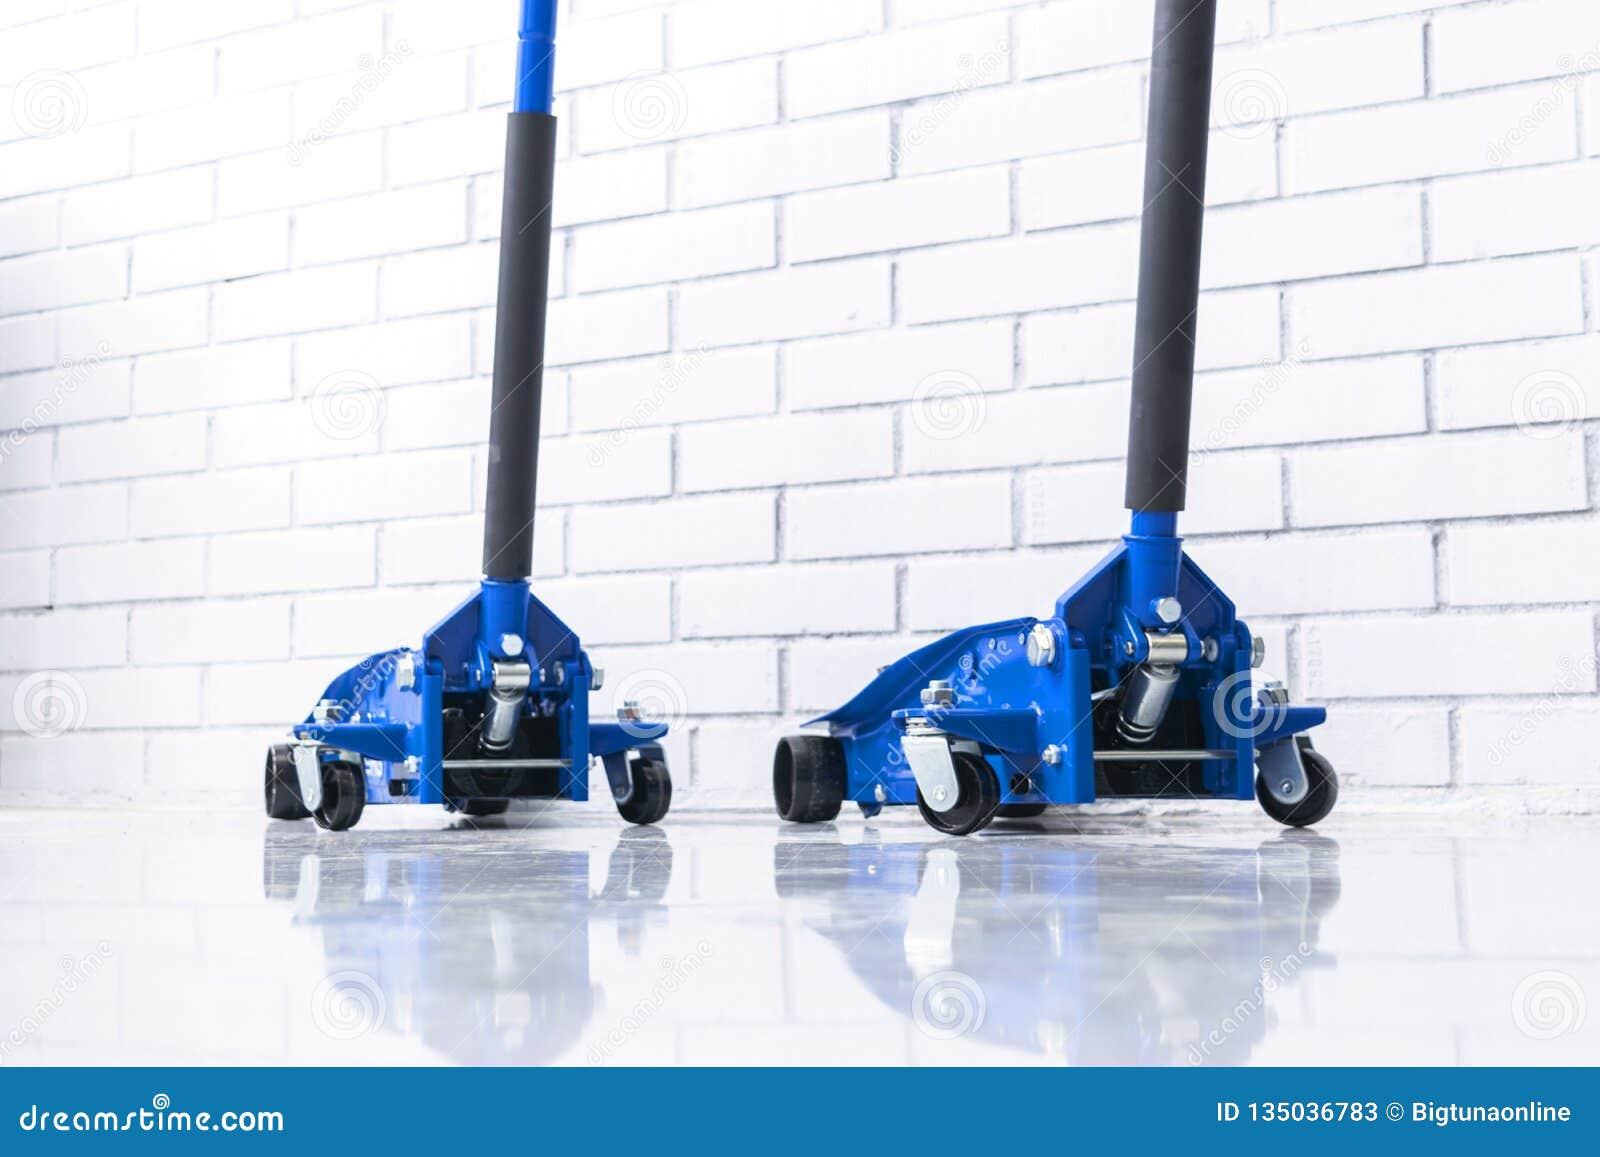 Hydraulic car floor jacks. Car Lift. Blue Hydraulic Floor Jack For car Repairing. Extra safety measures. Car service station.